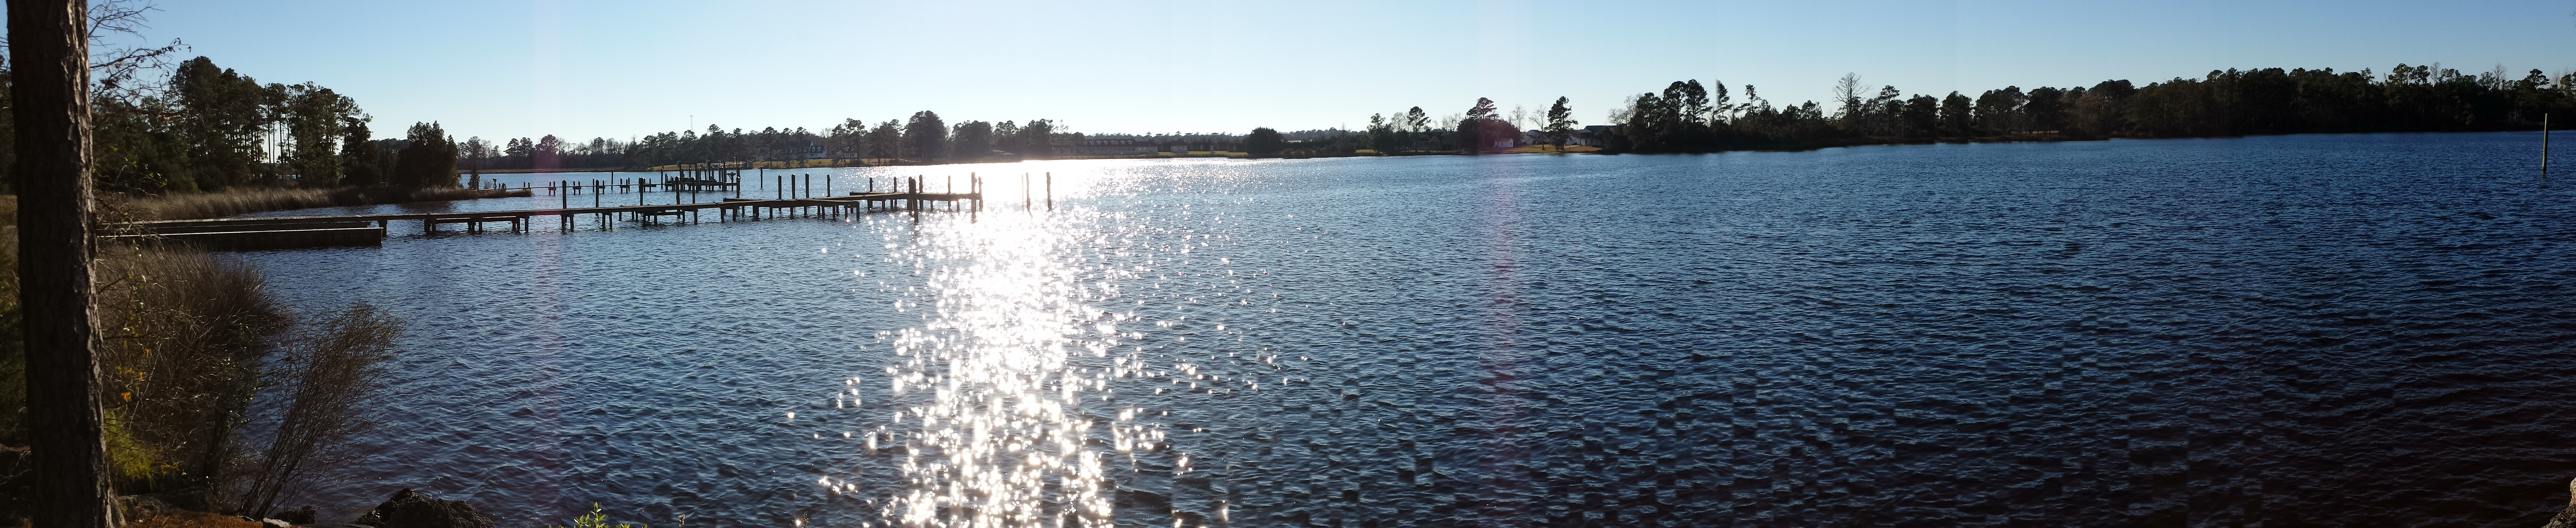 plantation-harbor-waterfront-view-1.jpg